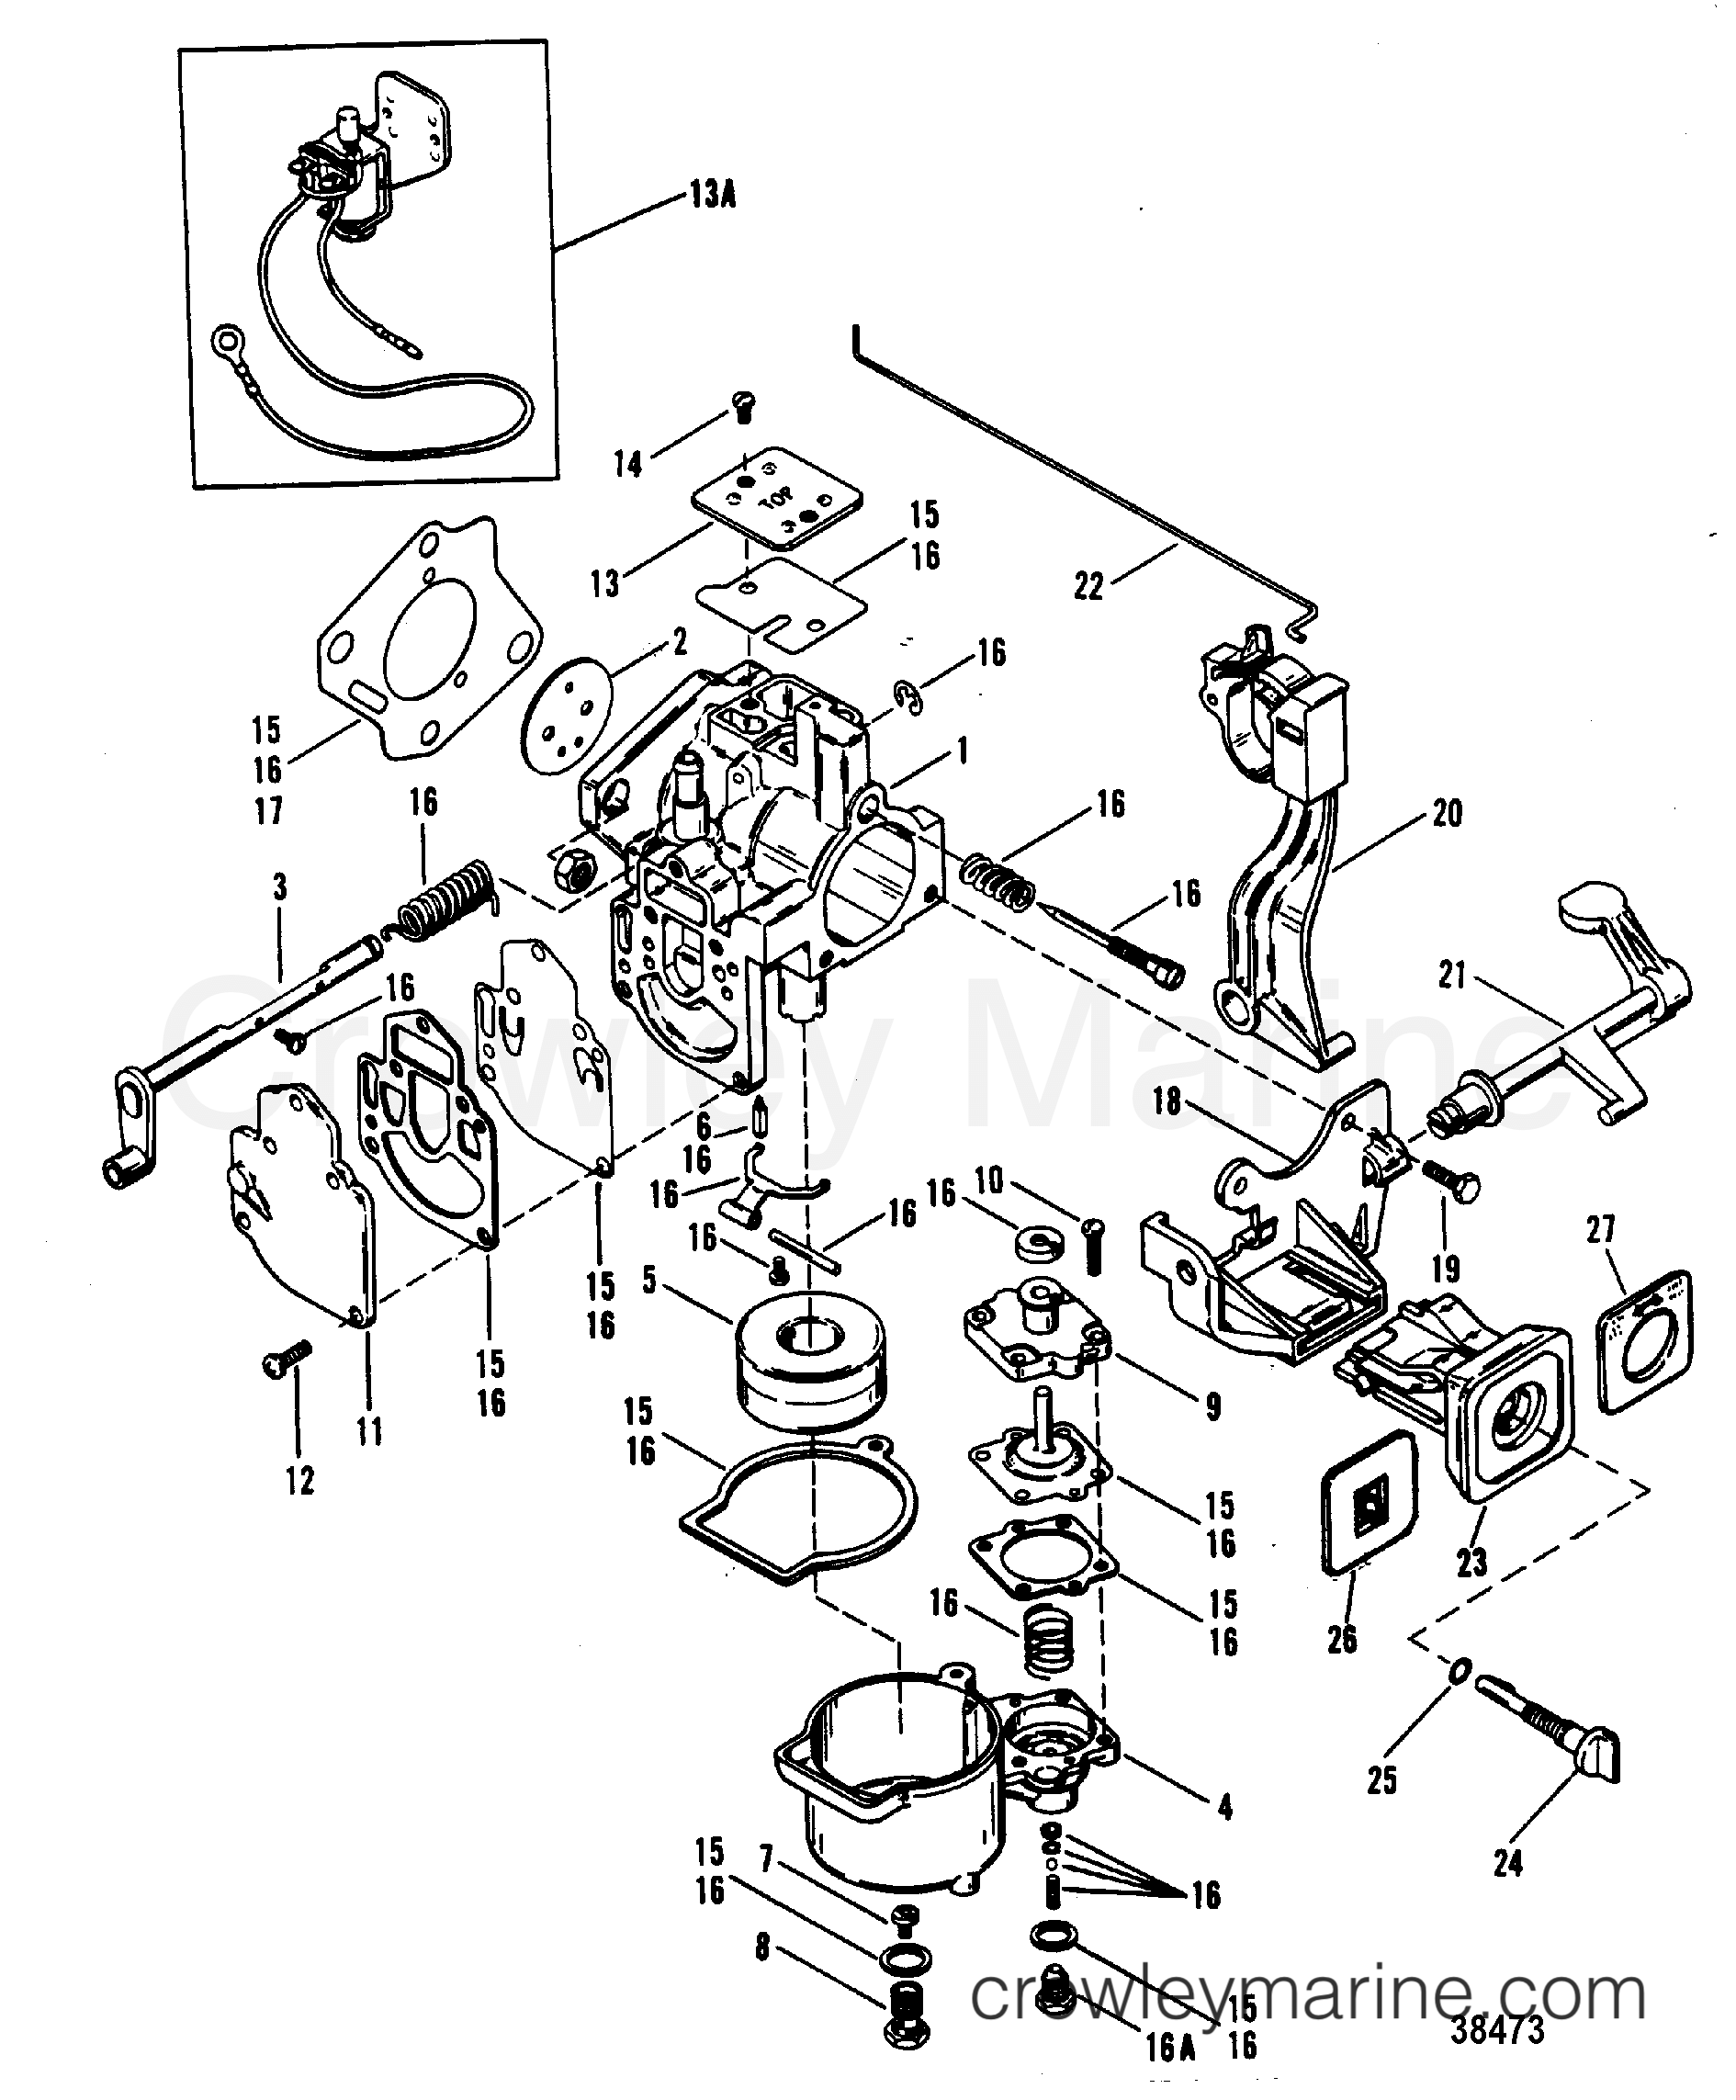 carburetor wmc 9 10 11 12 24 25 26 27 1977 mariner. Black Bedroom Furniture Sets. Home Design Ideas